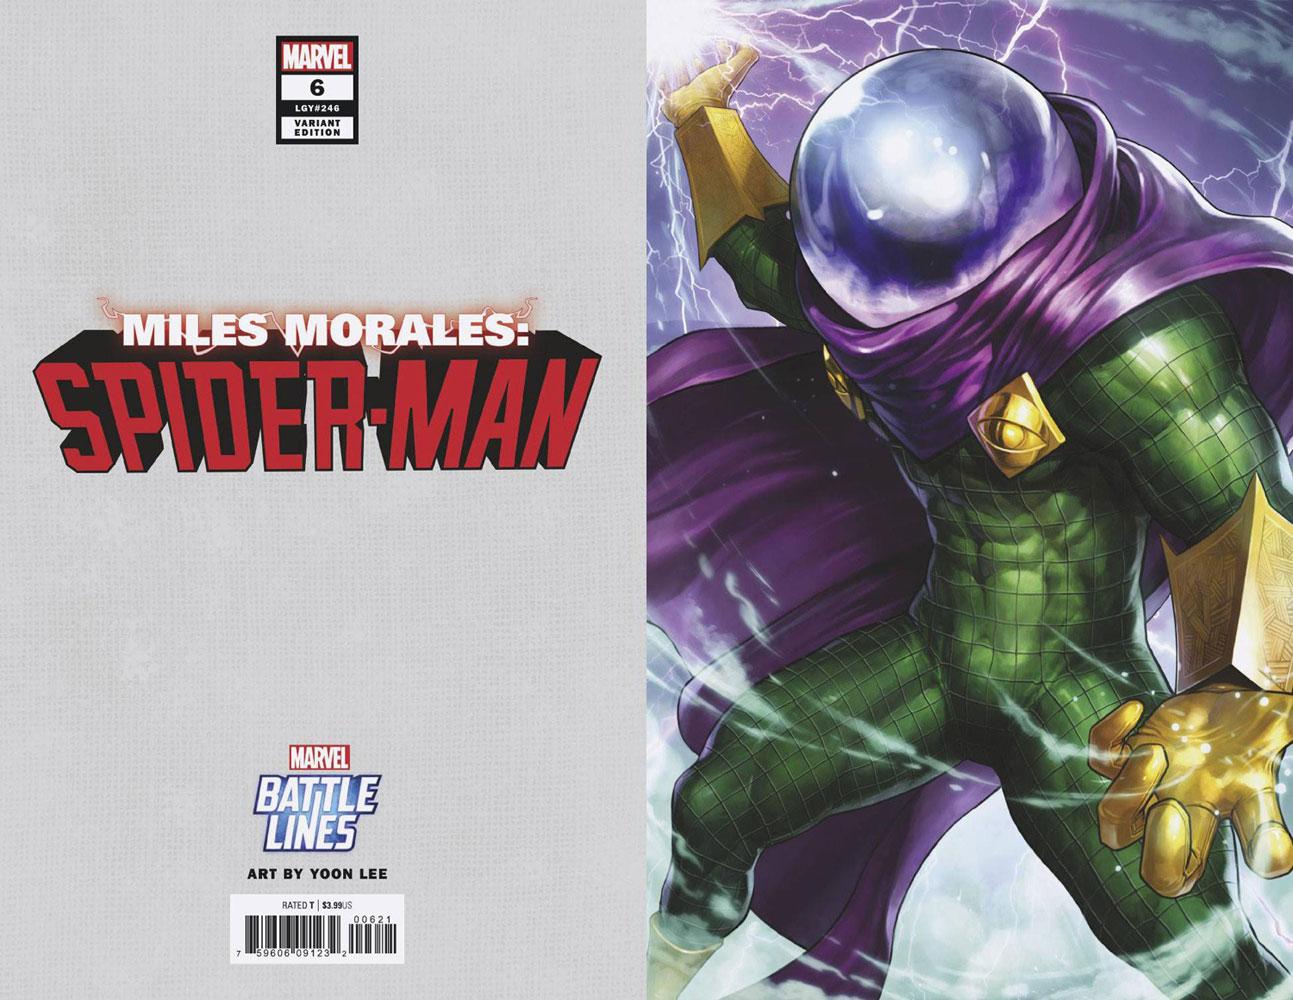 Miles Morales: Spider-Man #6 (variant Marvel Battle Lines cover - Yoon Lee) - Marvel Comics